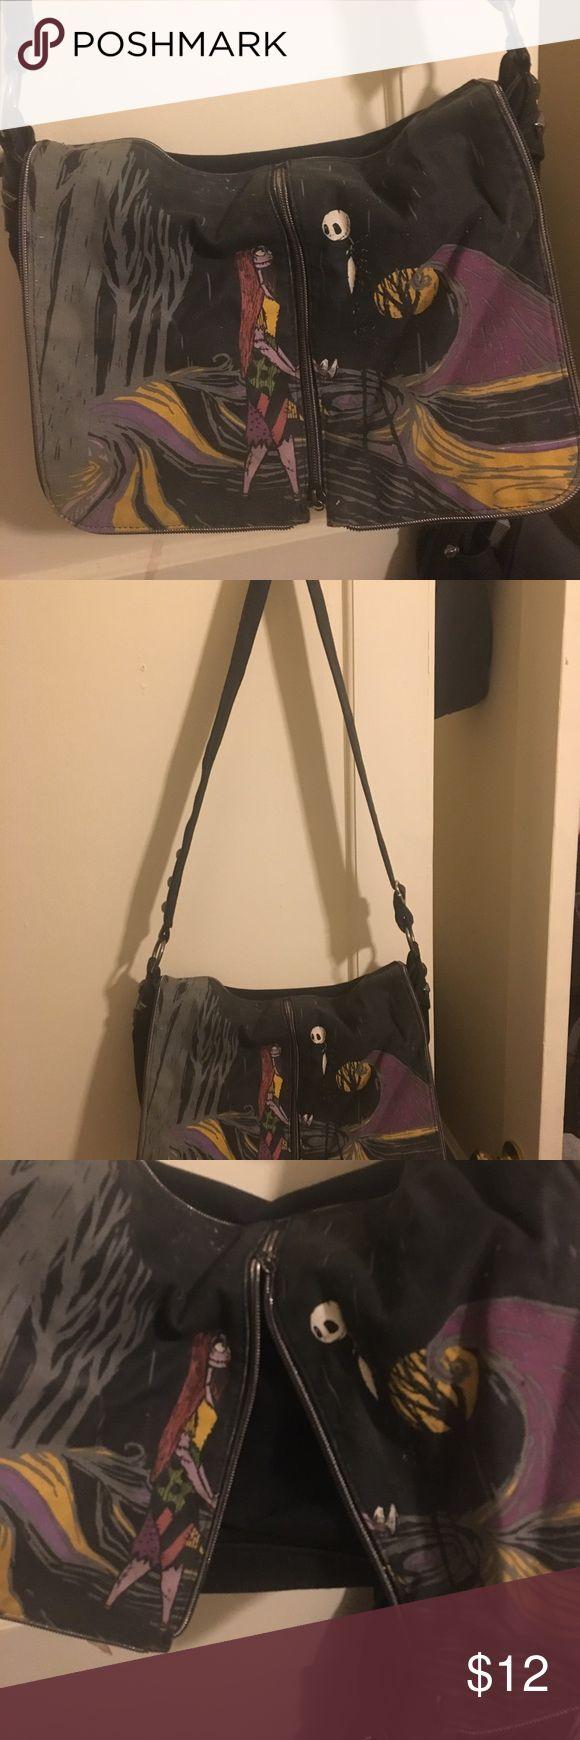 Nightmare before Christmas messenger bag Disney's nightmare before Christmas messenger bag, medium sized bag, lightly used Disney Bags Backpacks